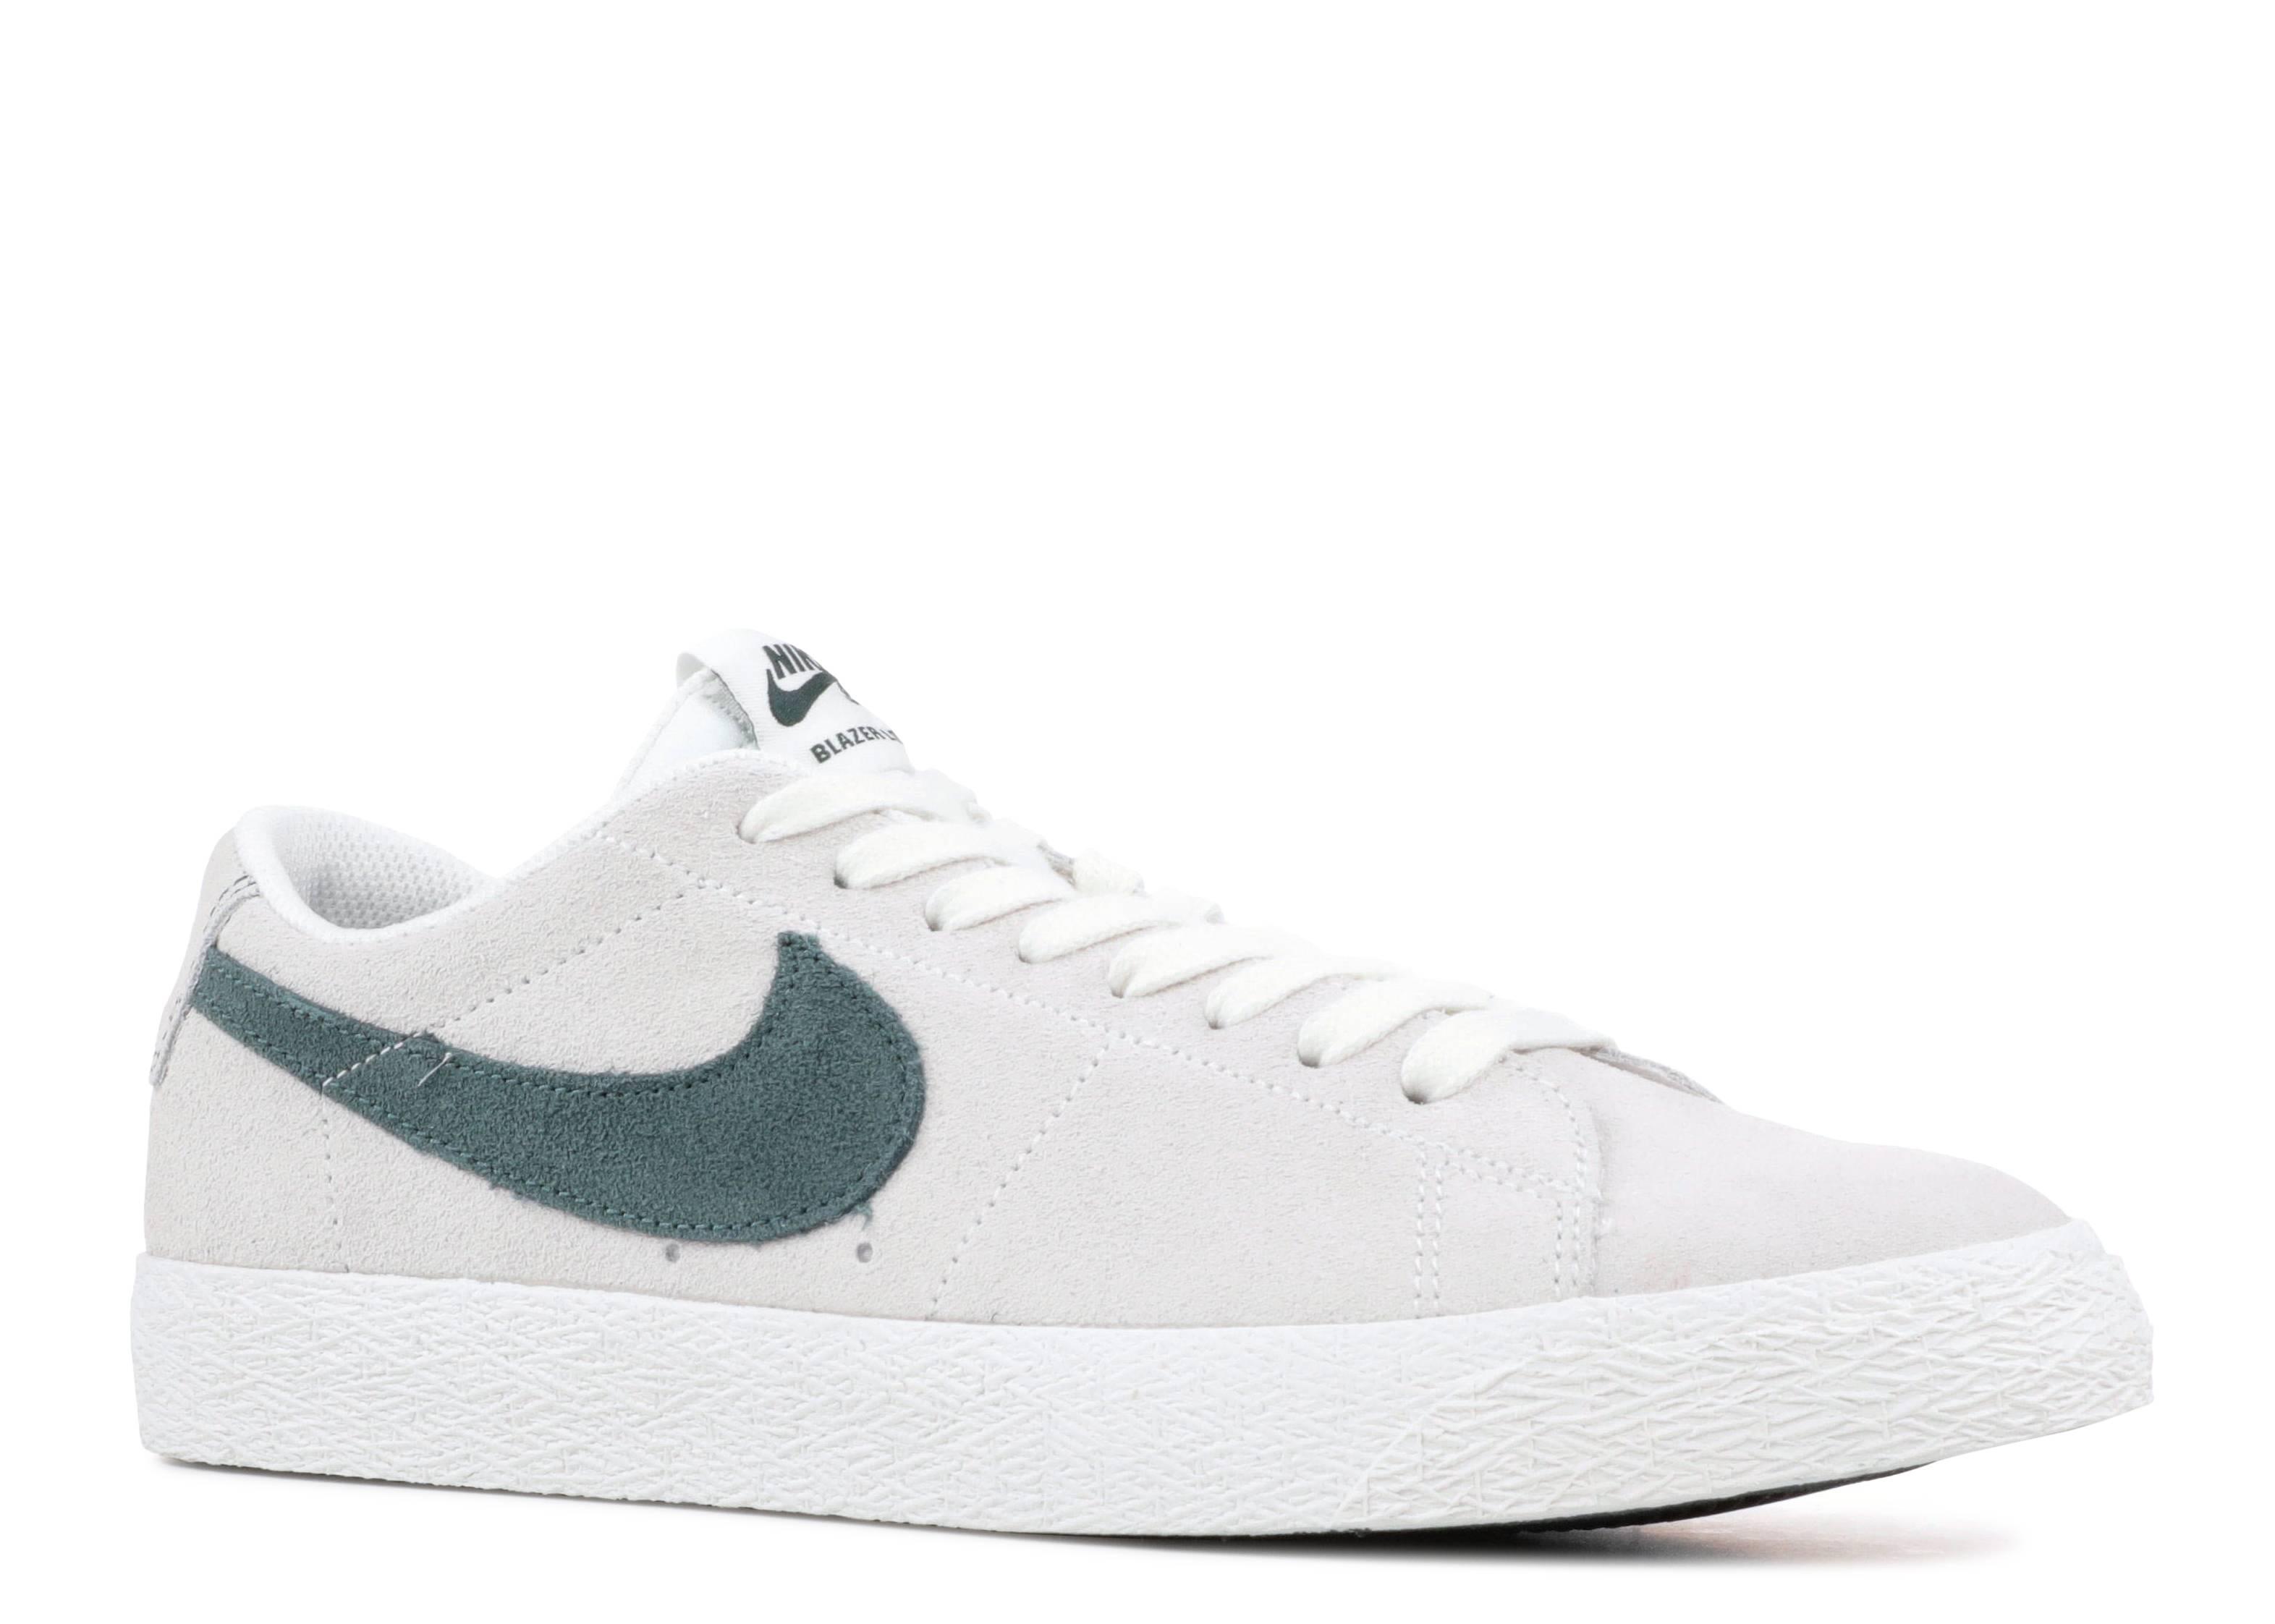 buy popular 25ab8 b0aab Nike Sb Zoom Blazer Low - Nike - 864347 101 - summit white deep jungle    Flight Club